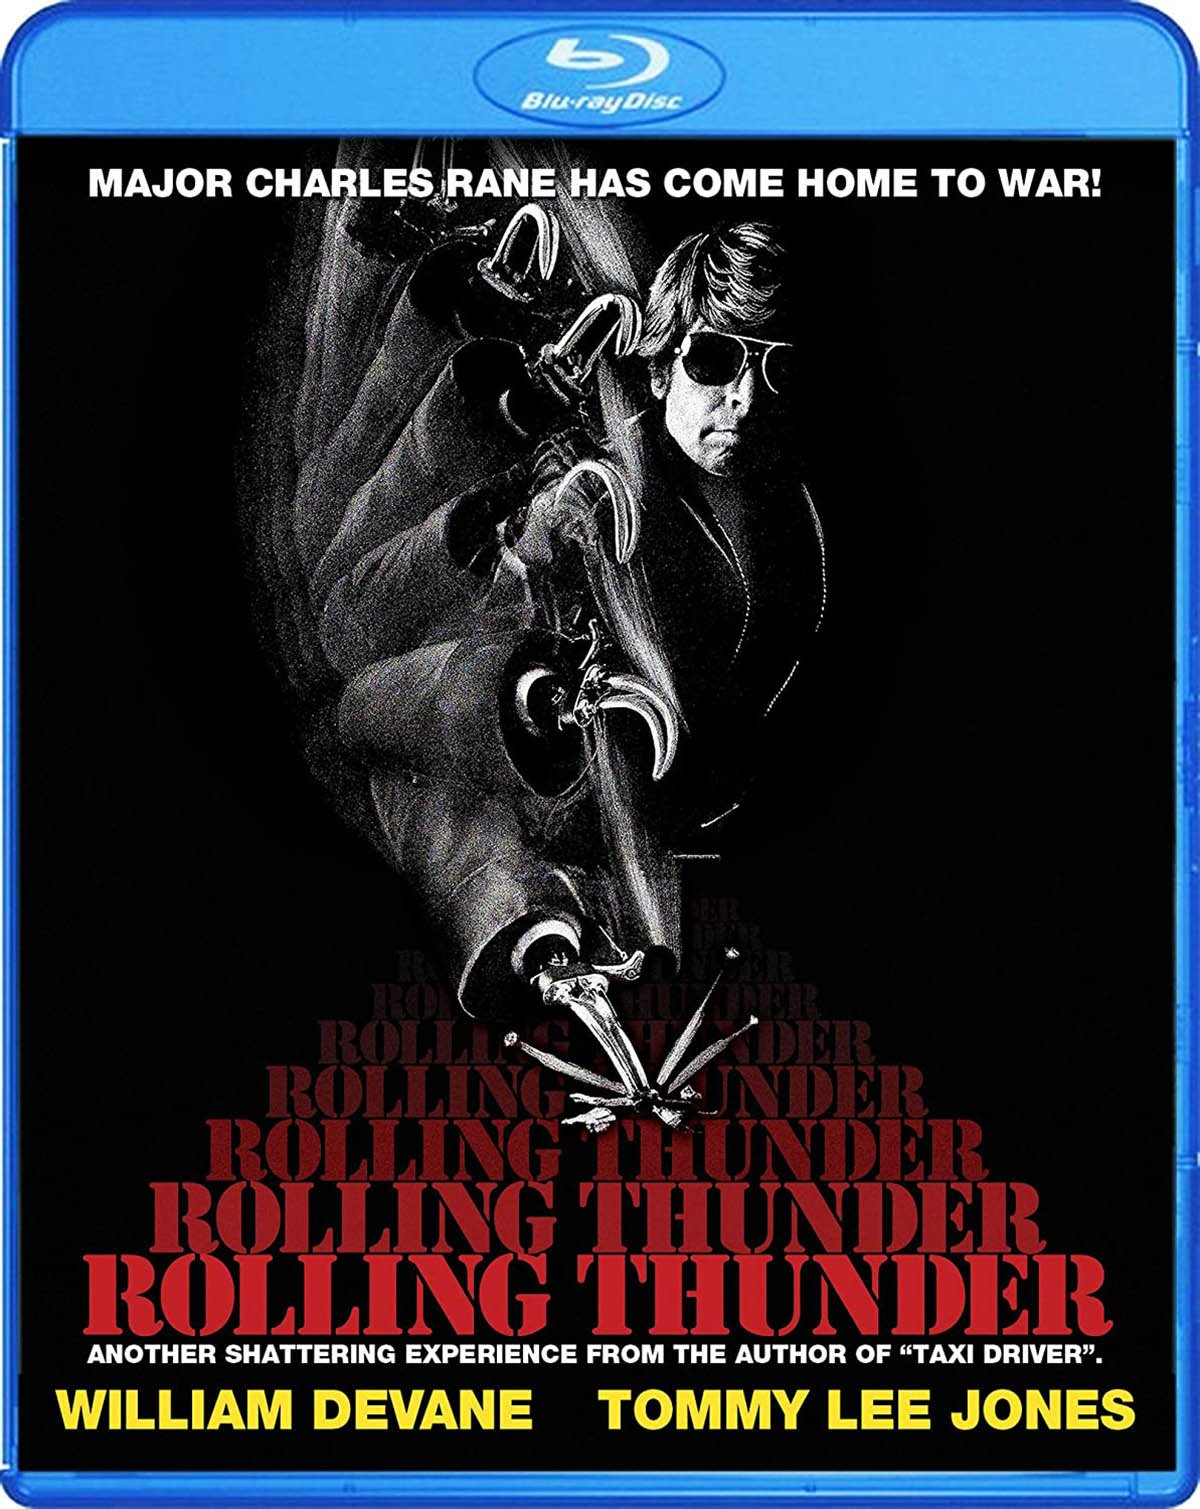 Blu-ray Review: Rolling Thunder - Slant Magazine